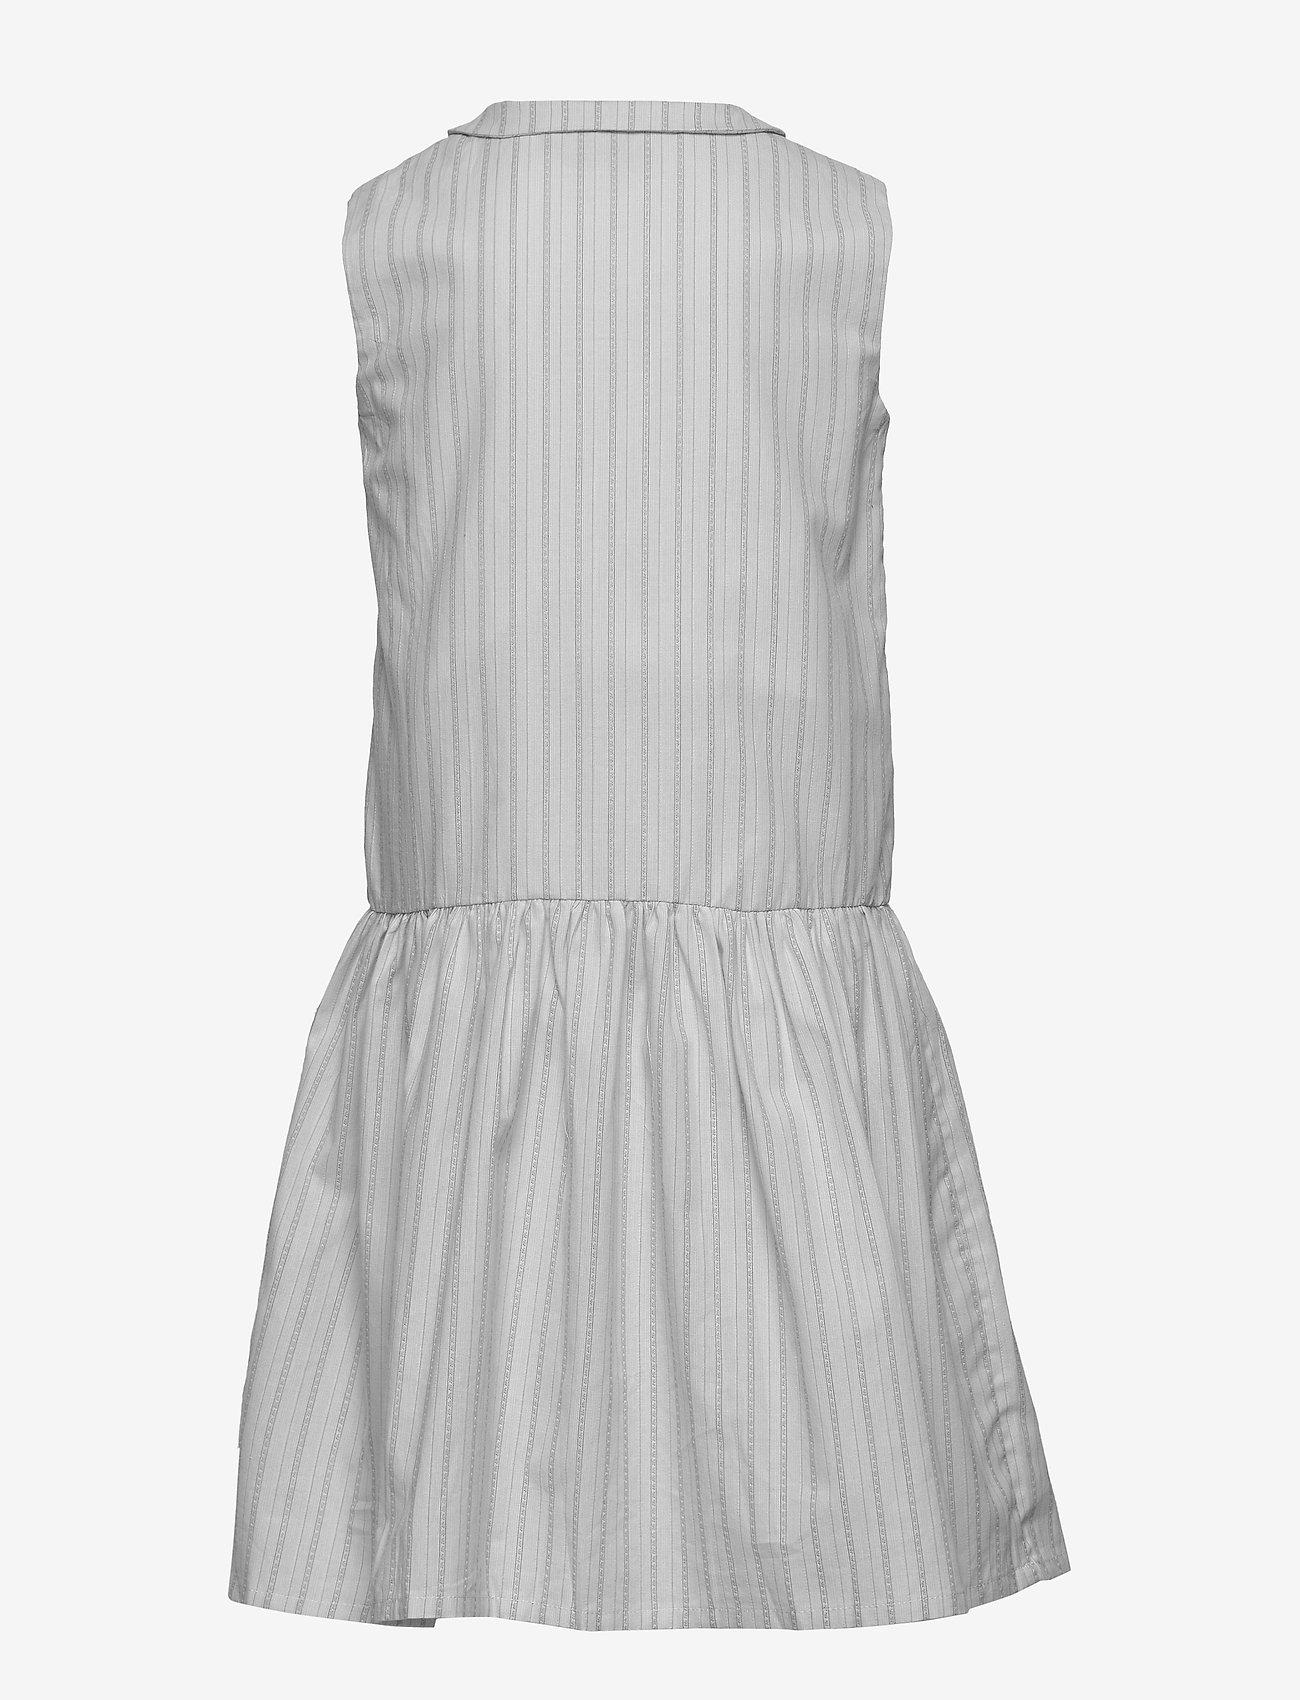 Dress Penny (Dove) (16.49 €) - Wheat TU5aP